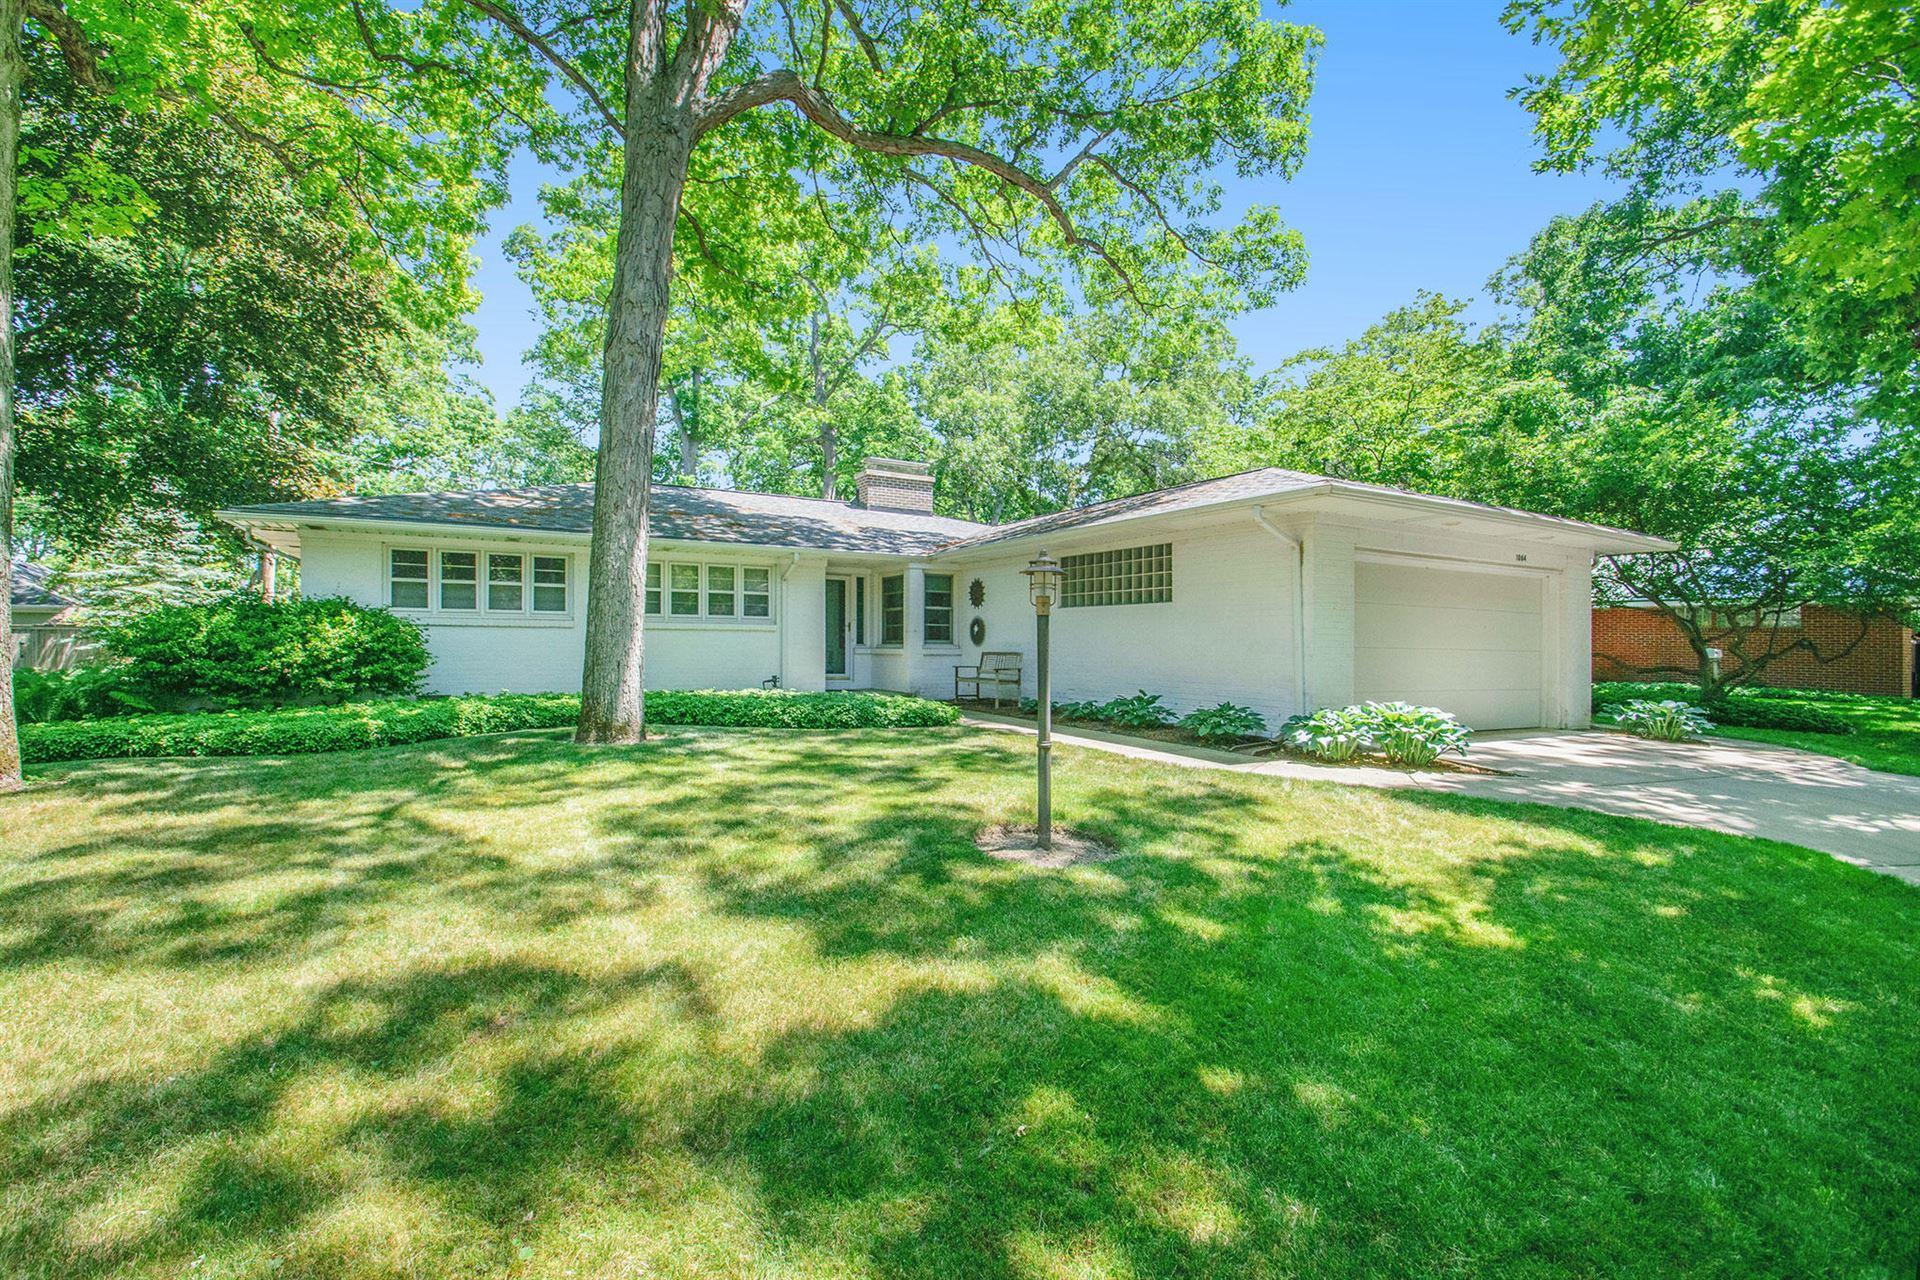 1064 Santa Barbara Drive SE, East Grand Rapids, MI 49506 - MLS#: 21102155